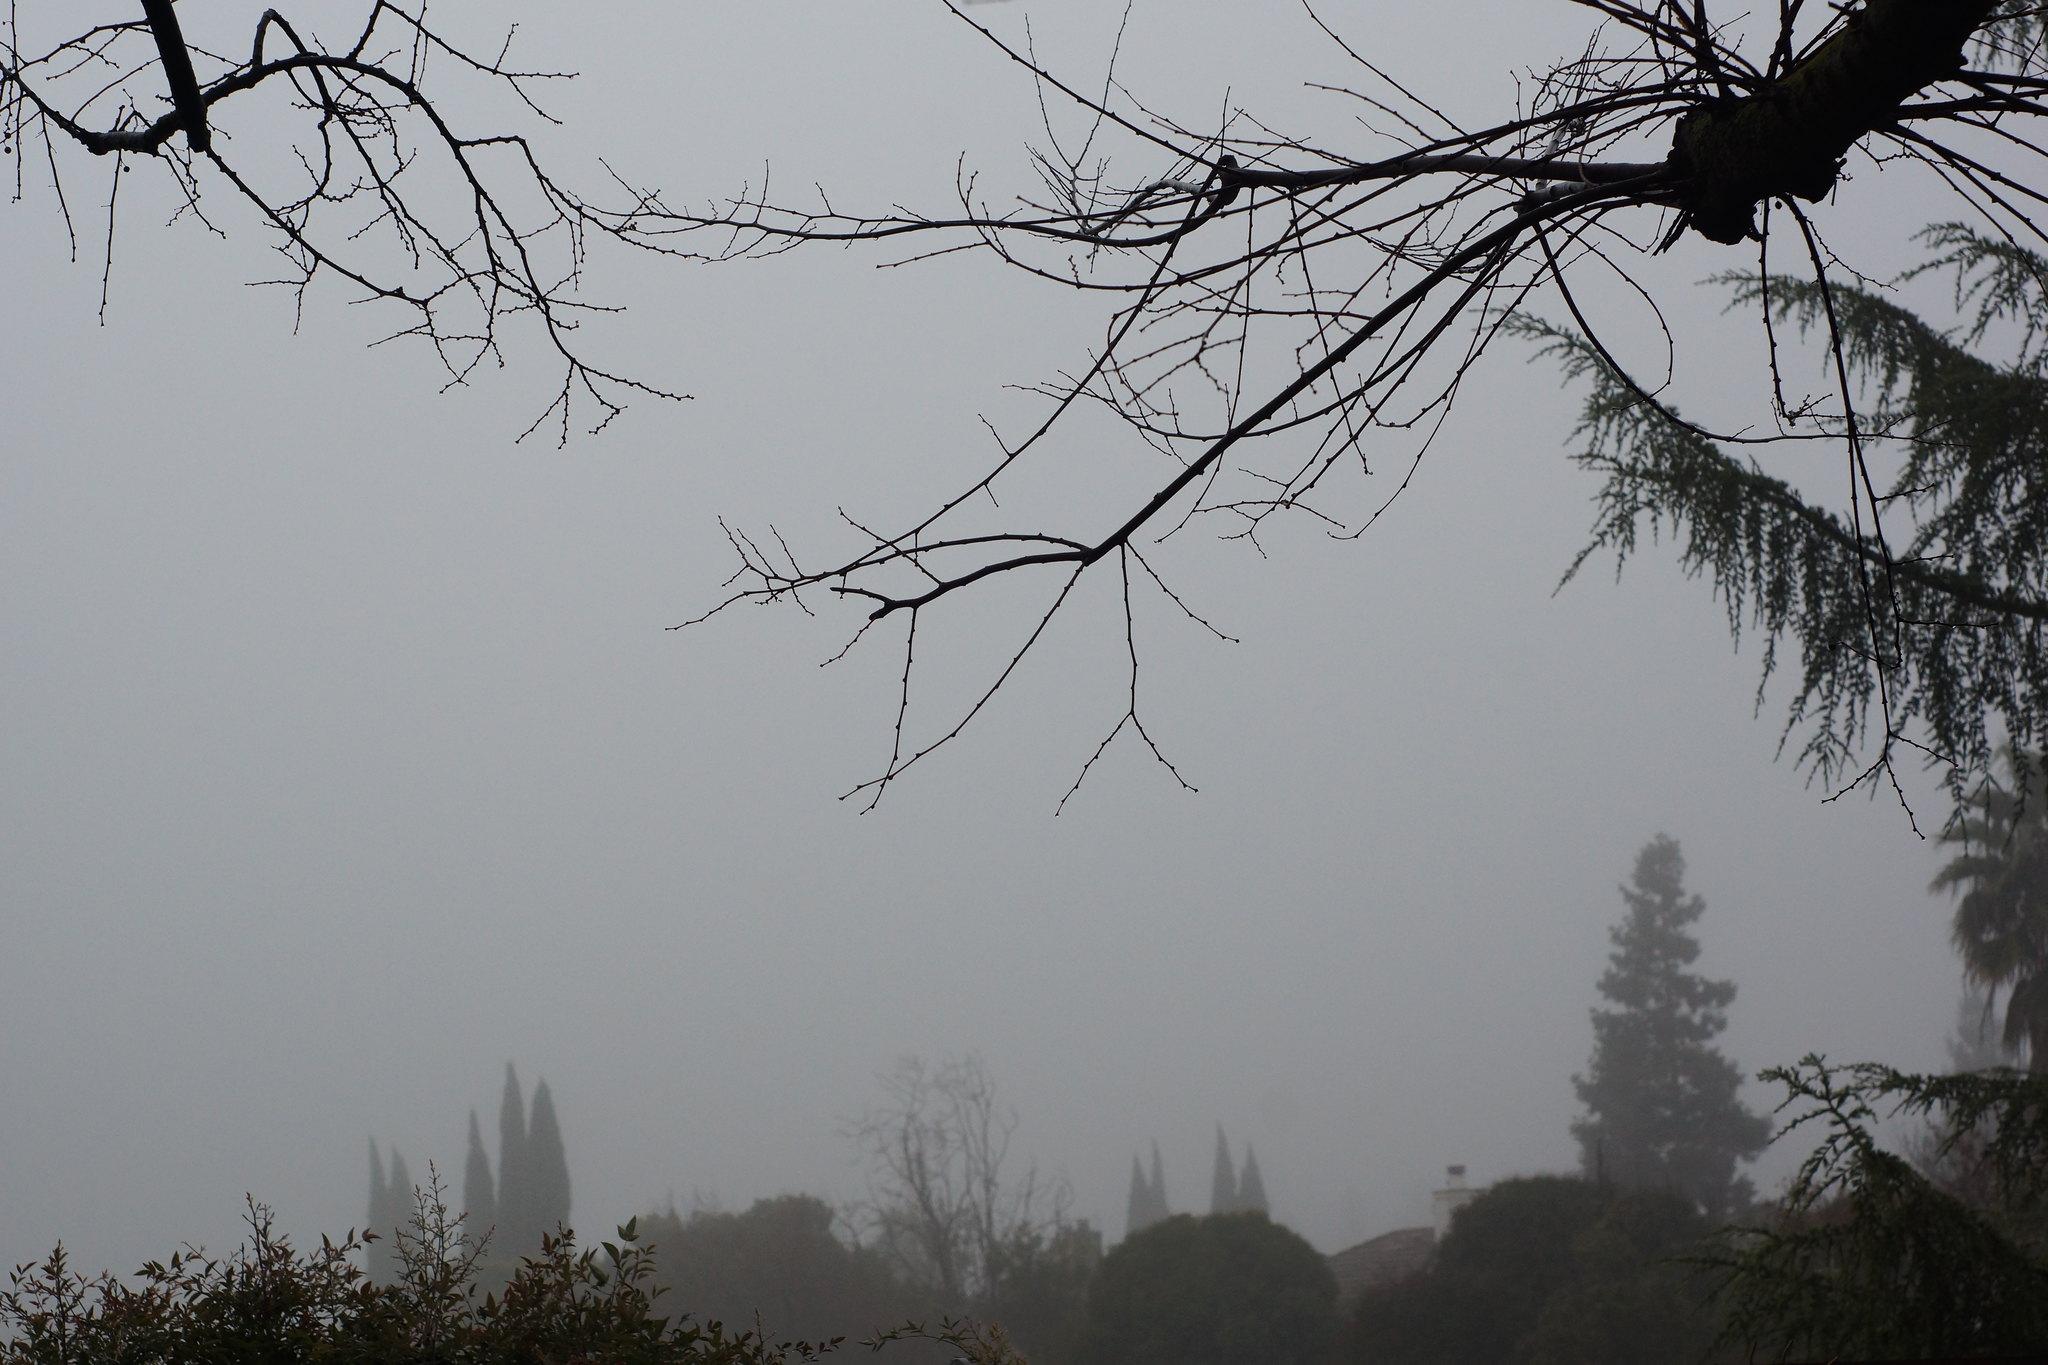 2017-01-15 No colorful Sunrise, just Fog [#3]